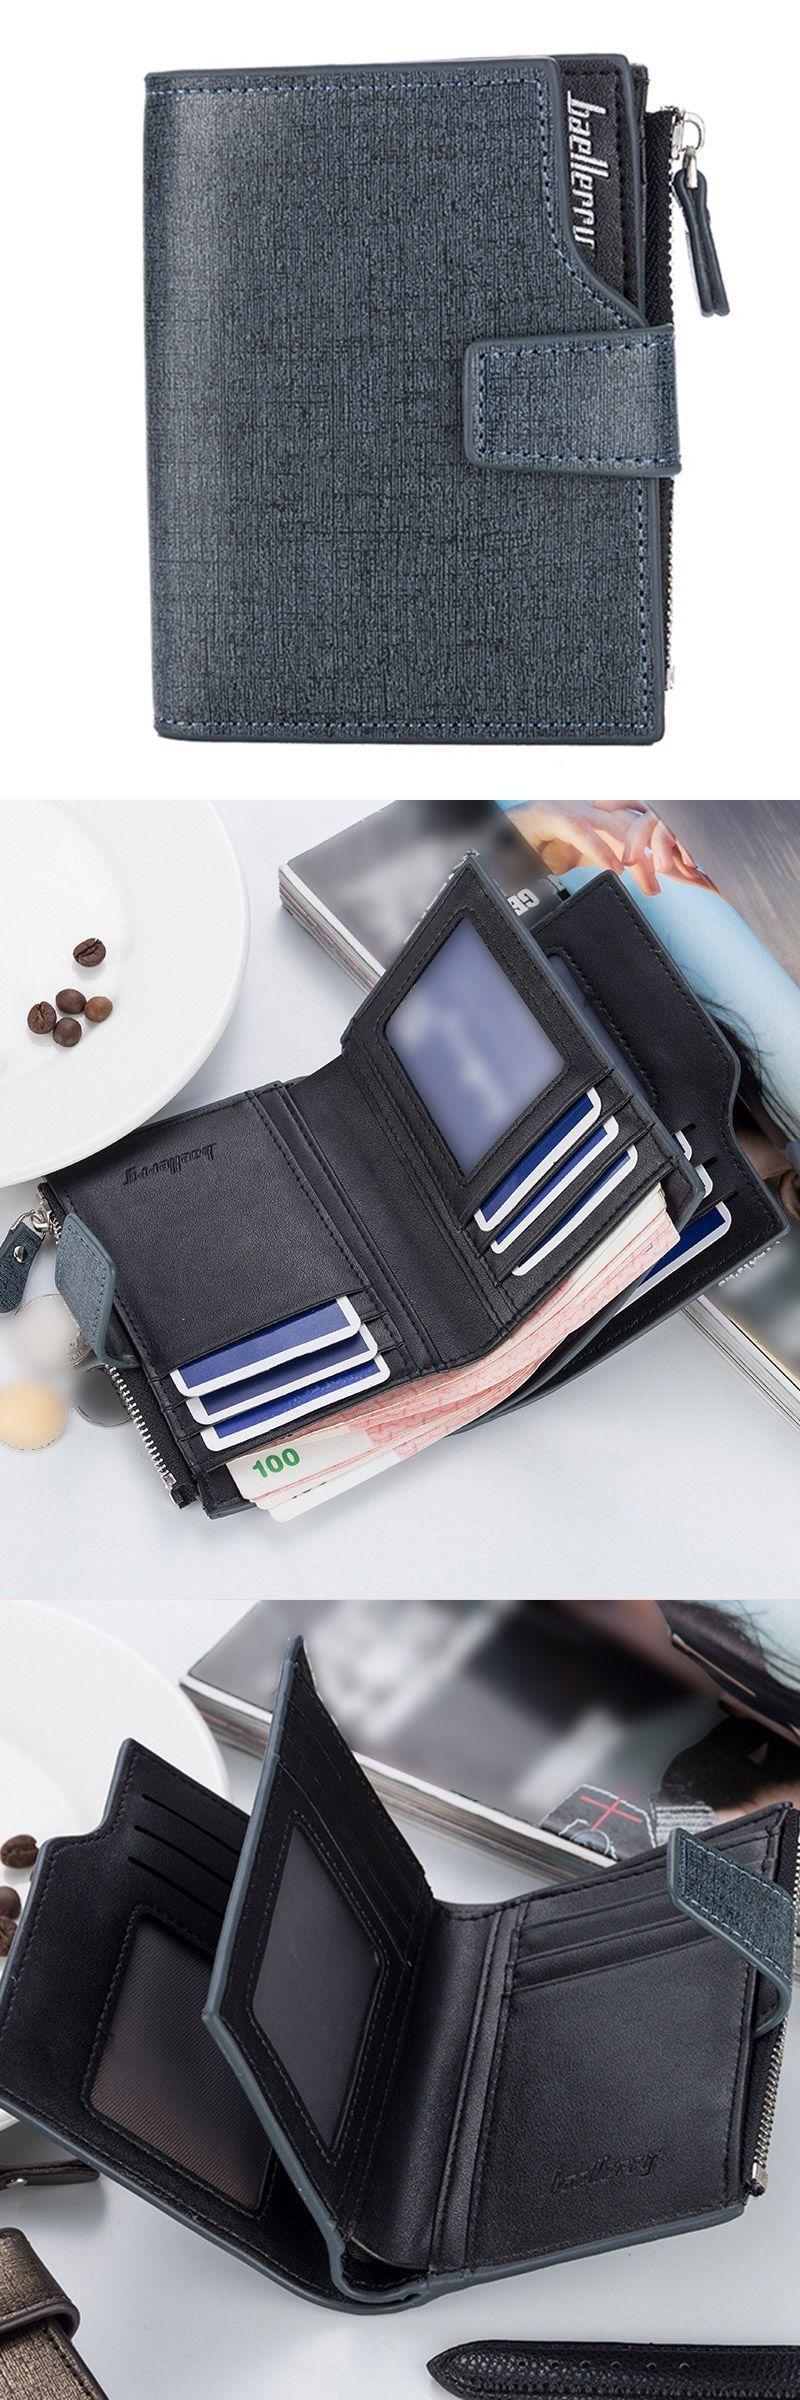 QA/_ Business Style Men/'s Fashion Long Thin Wallet Money Cash Card Storage Purs